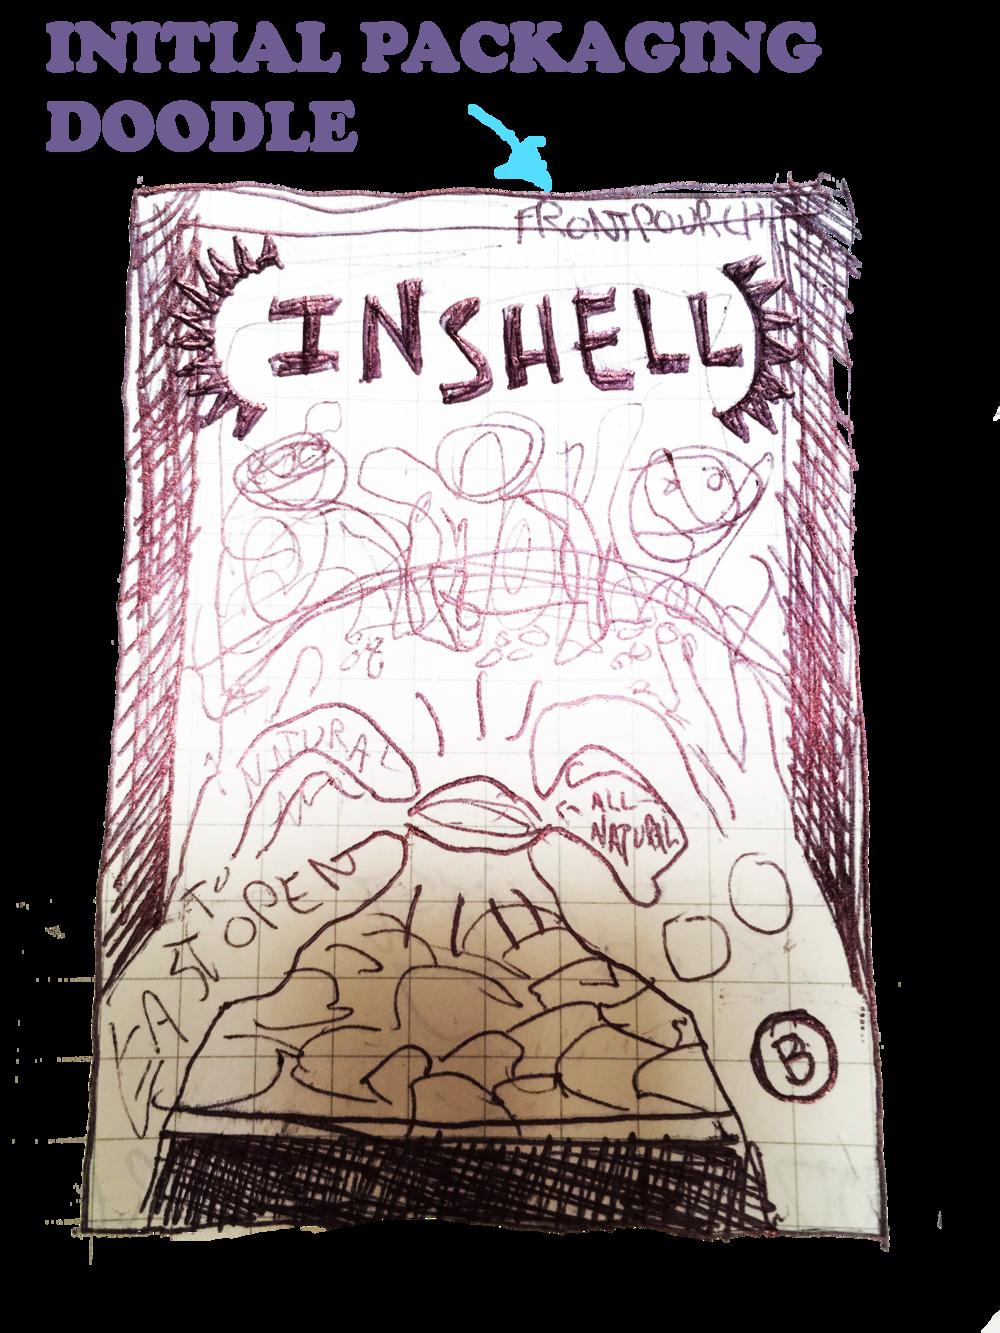 doodle1.png